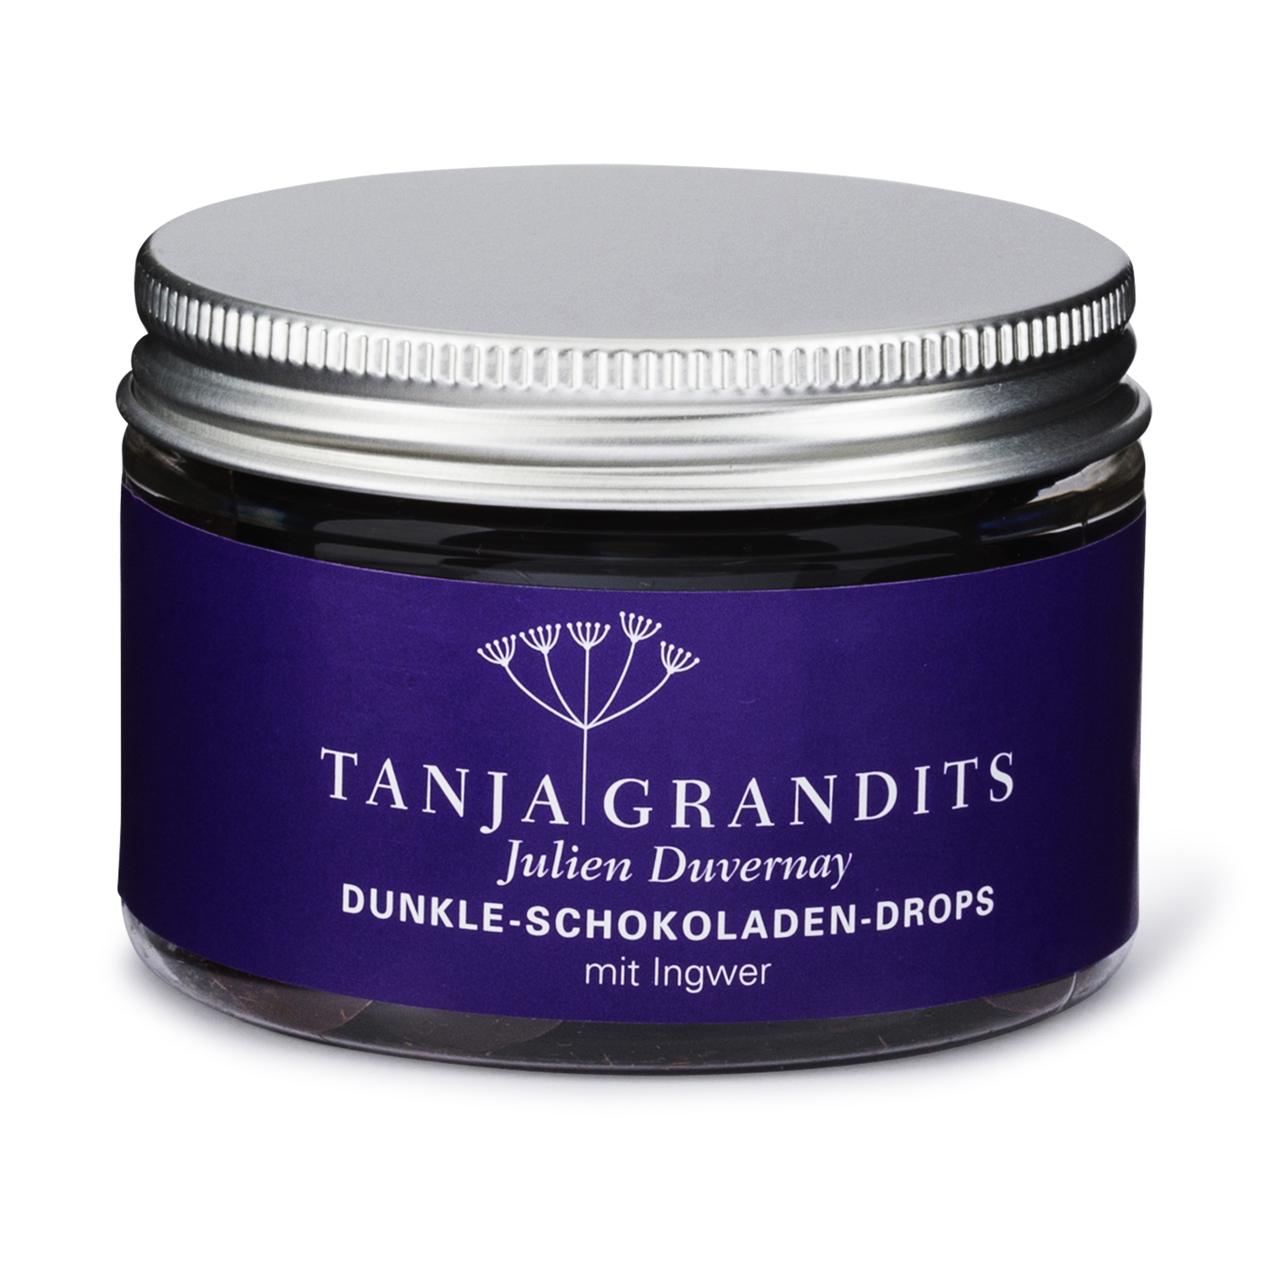 Tanja Grandits: Schokoladen Drops Ingwer Dunkle Schokolade 67%